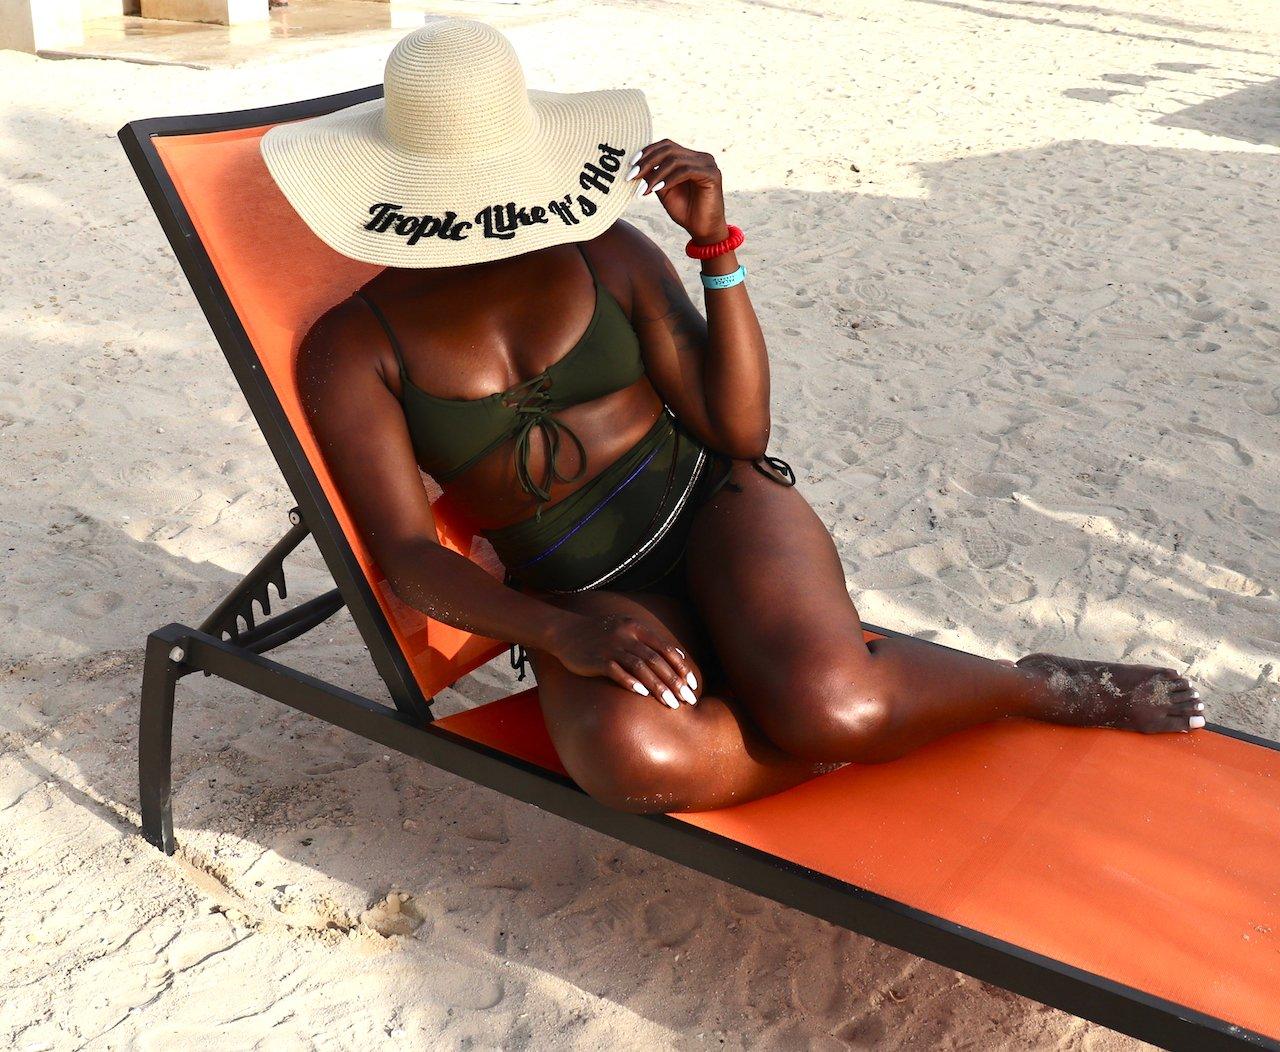 LACE UP HIGH-WAISTED BIKINI OCHO RIOS JAMAICA